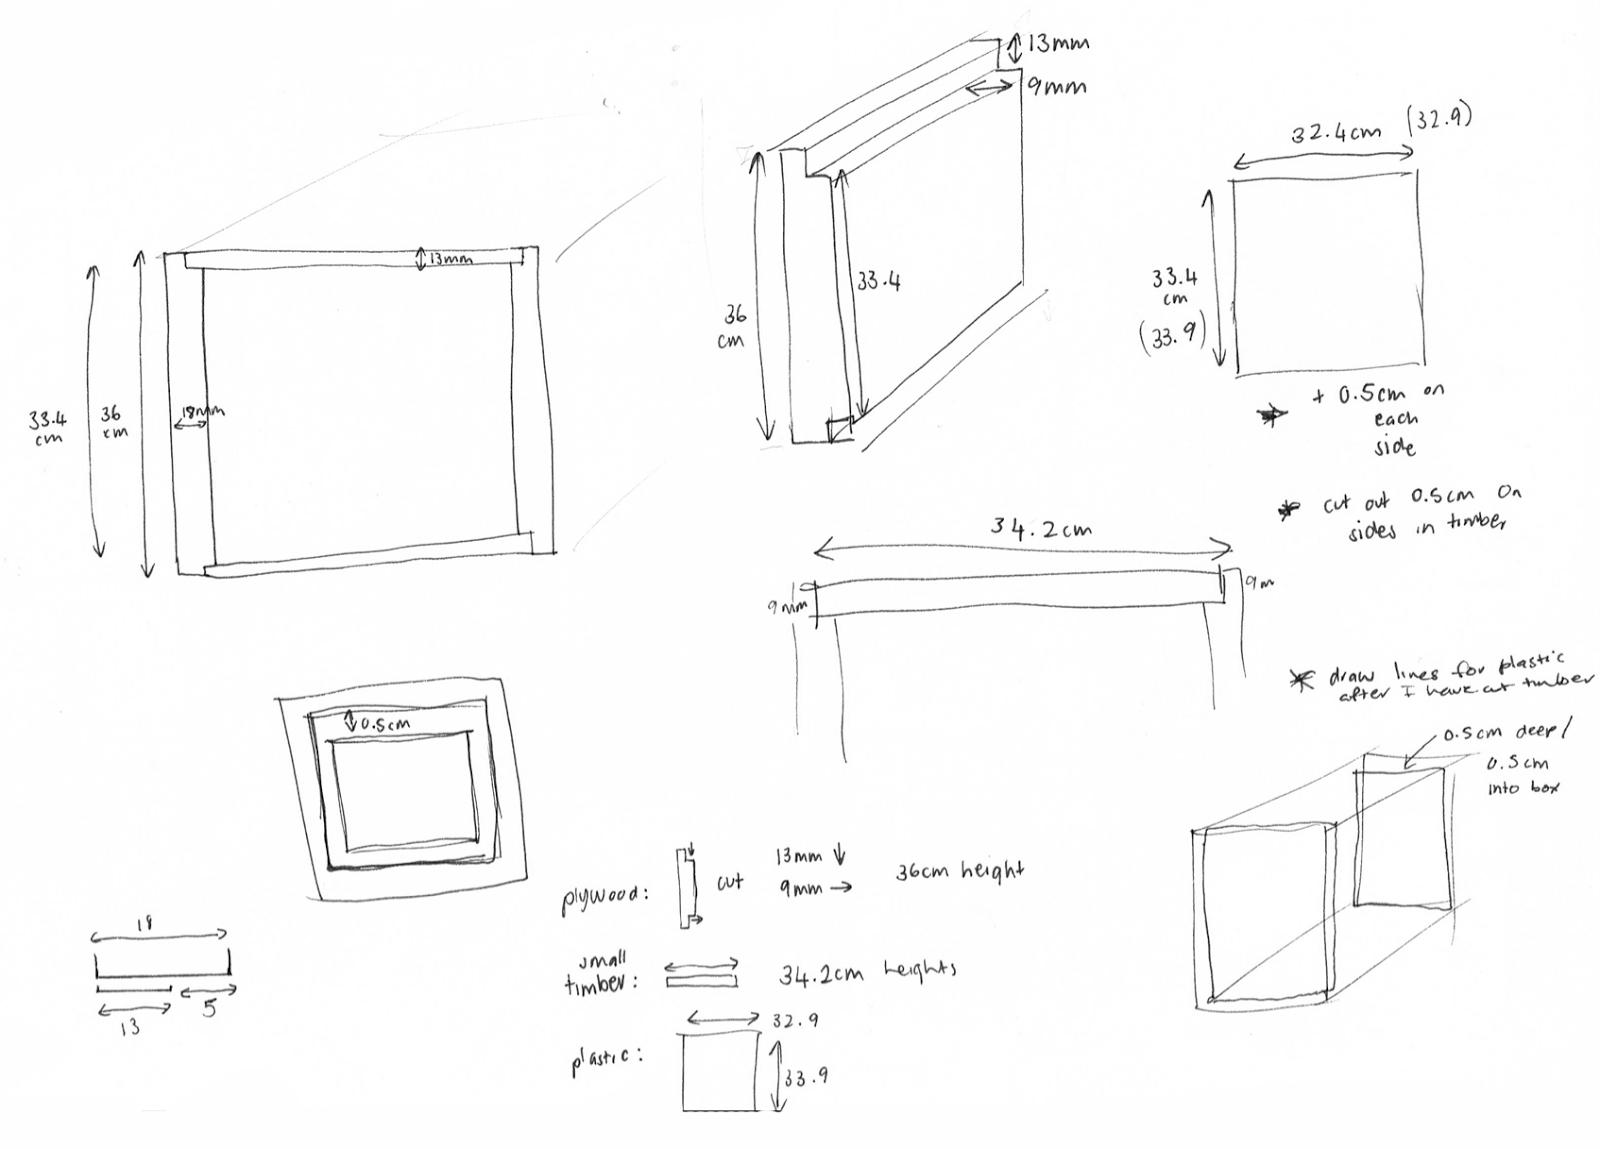 Design Studio IIB (Spatial) 258 ihi & wehi Danielle Wilson